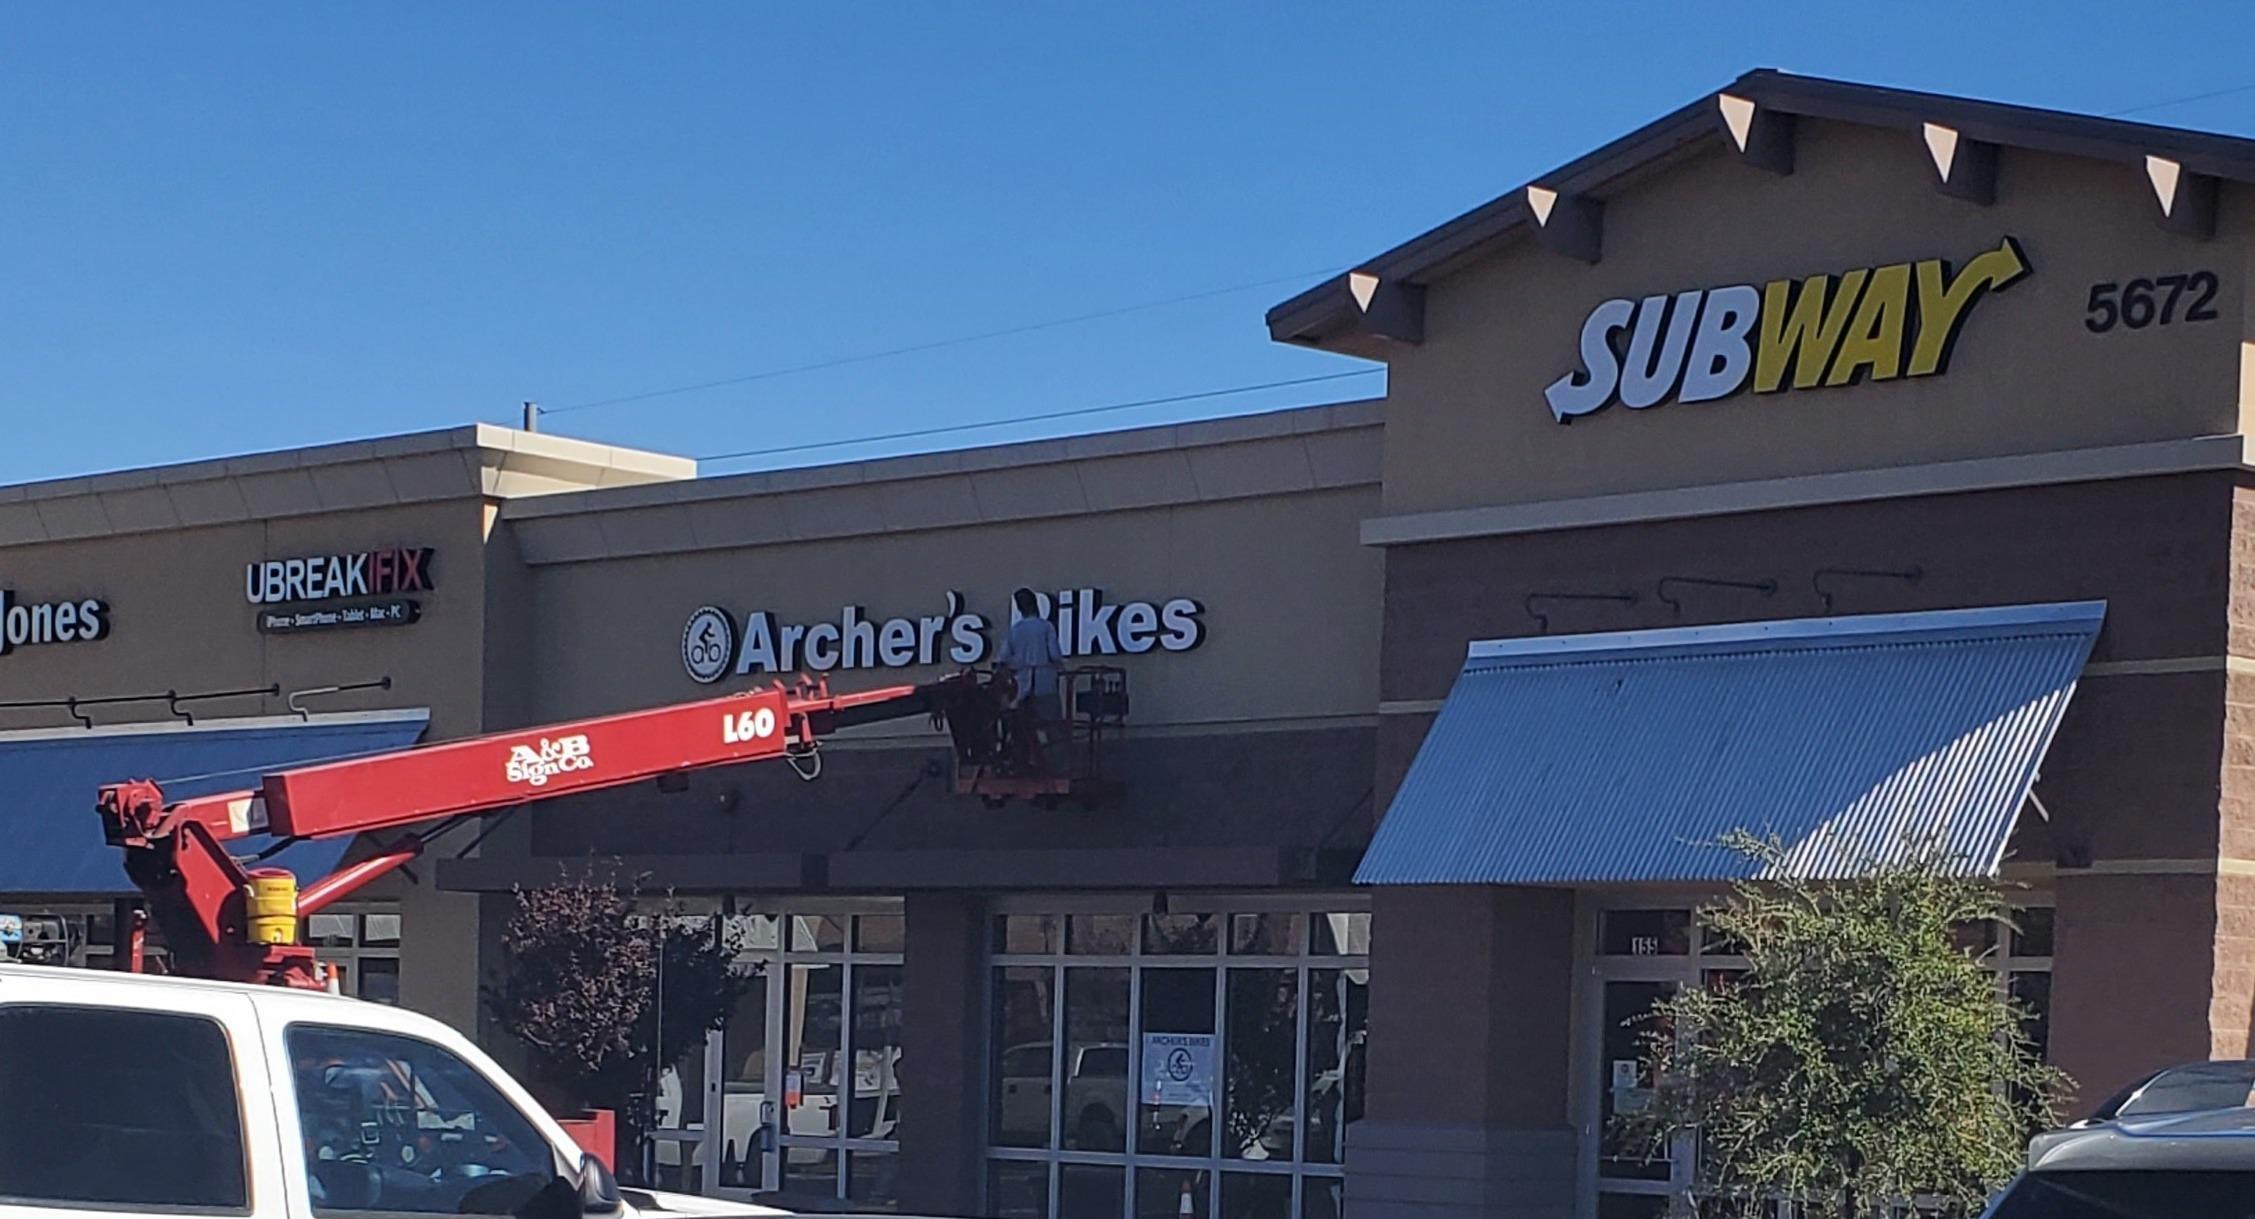 Archer's Bikes